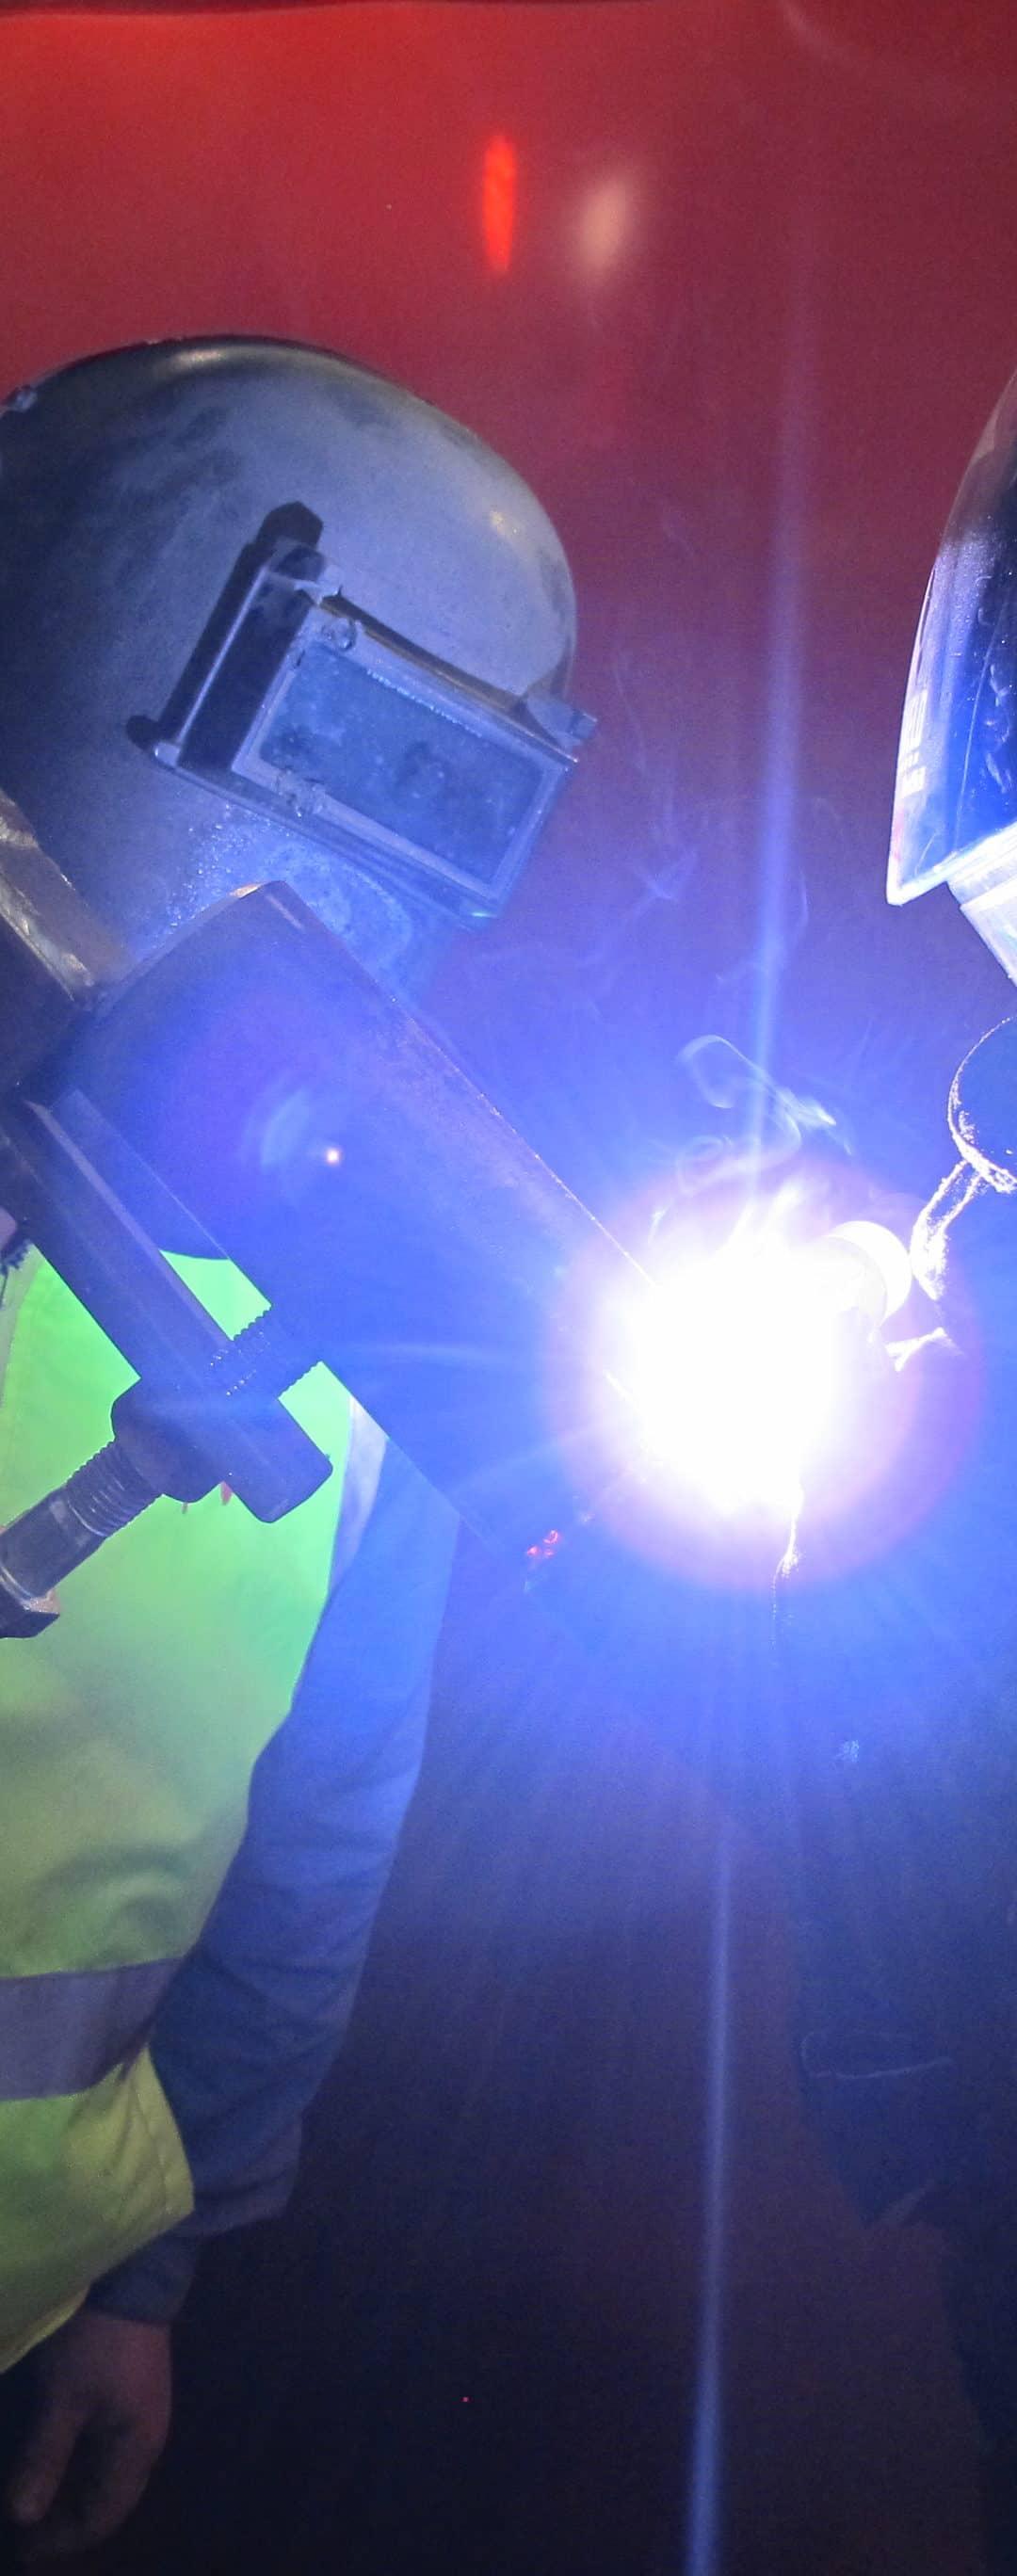 welding inspection